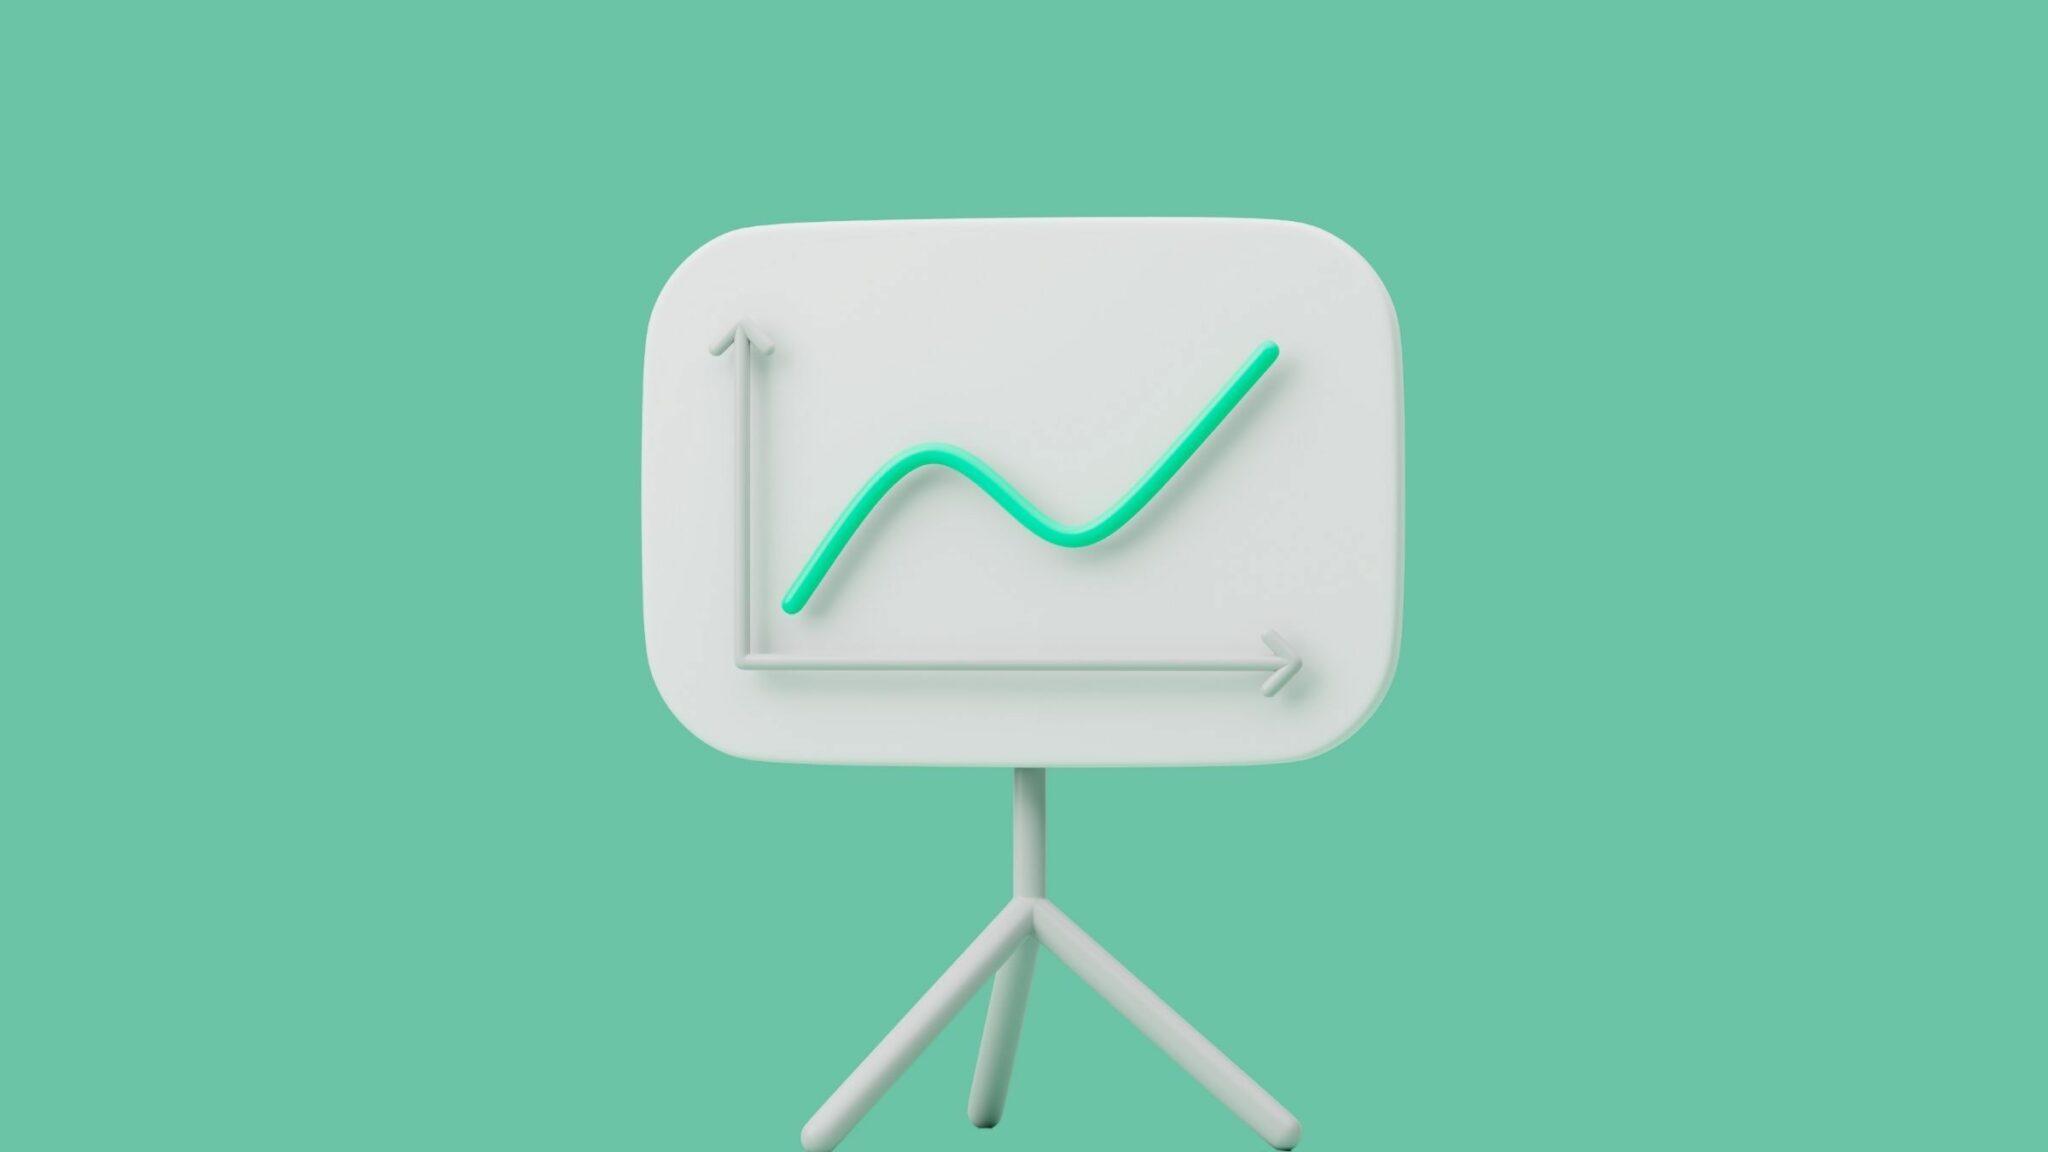 Hedge-Fund-Chart-Image-scaled.jpg